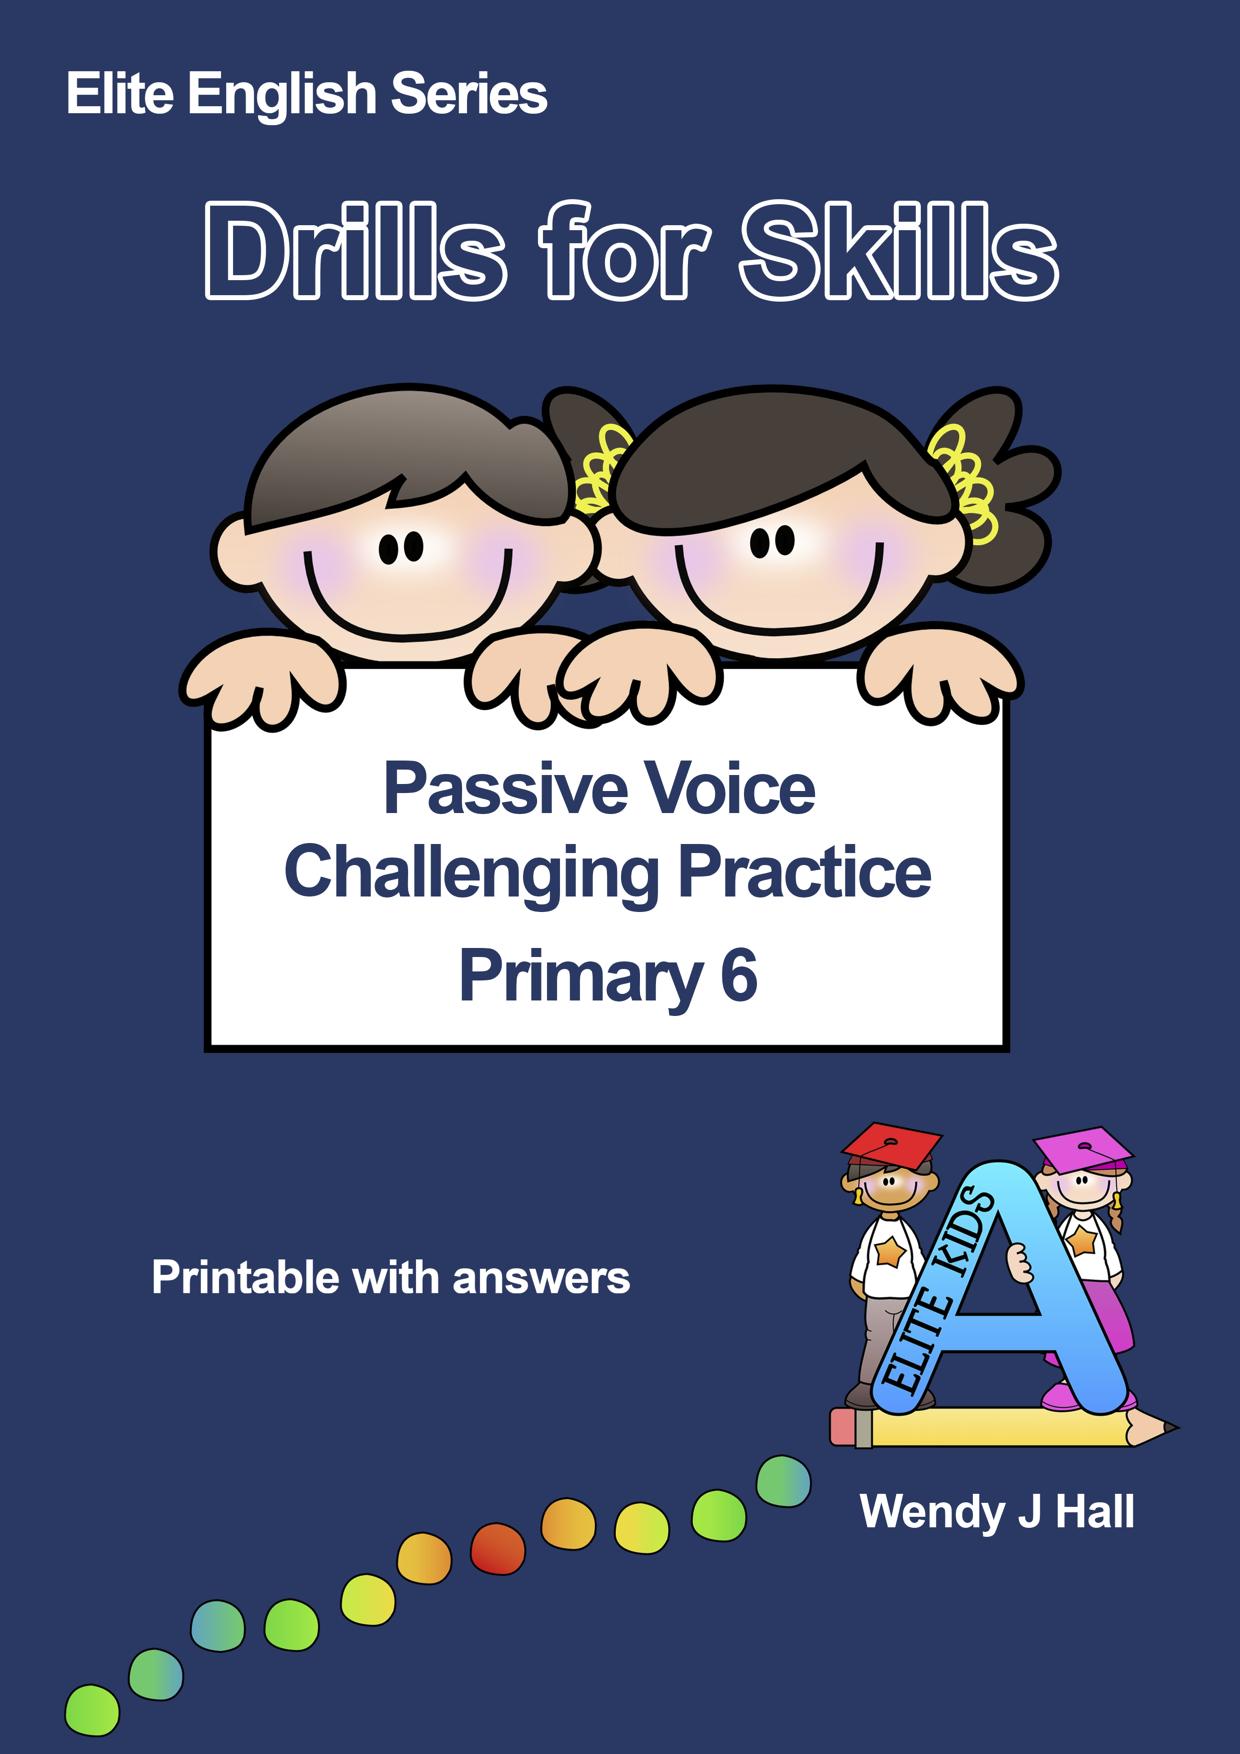 Drills for Skills - Passive Voice Challenging Practice